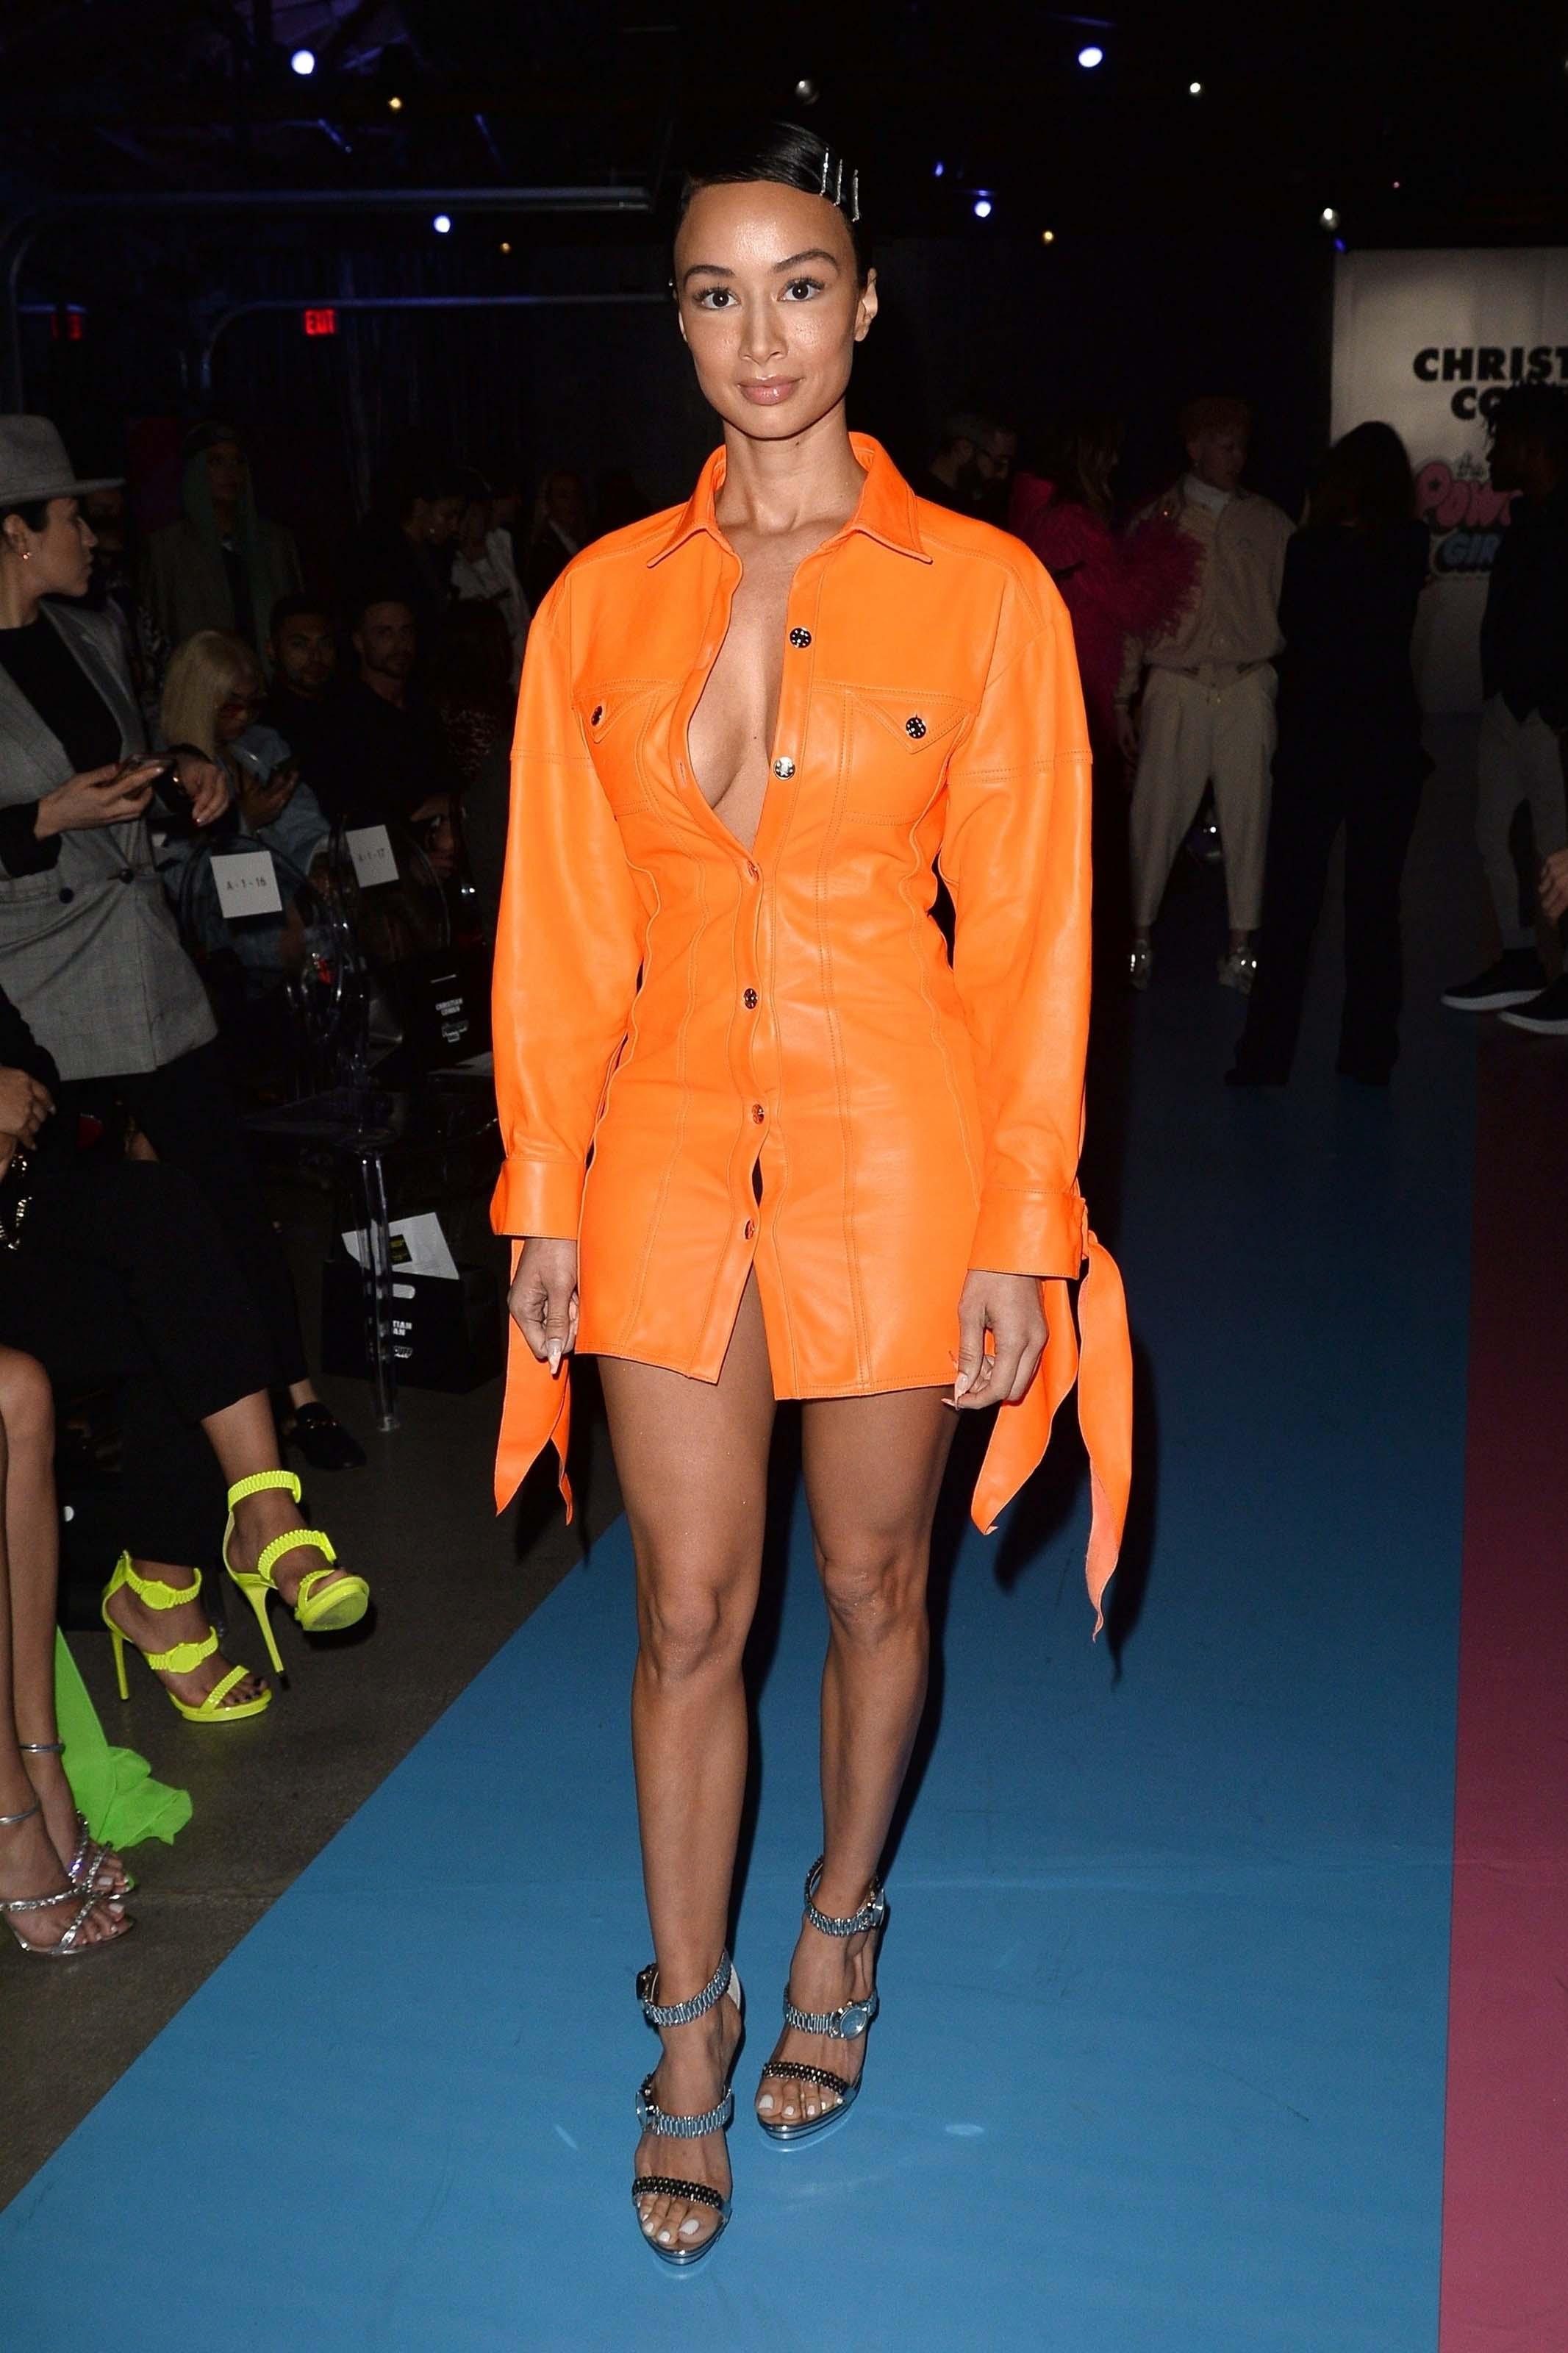 Draya Michele attends the Christian Cowan PowerPuff Girls Fashion Show